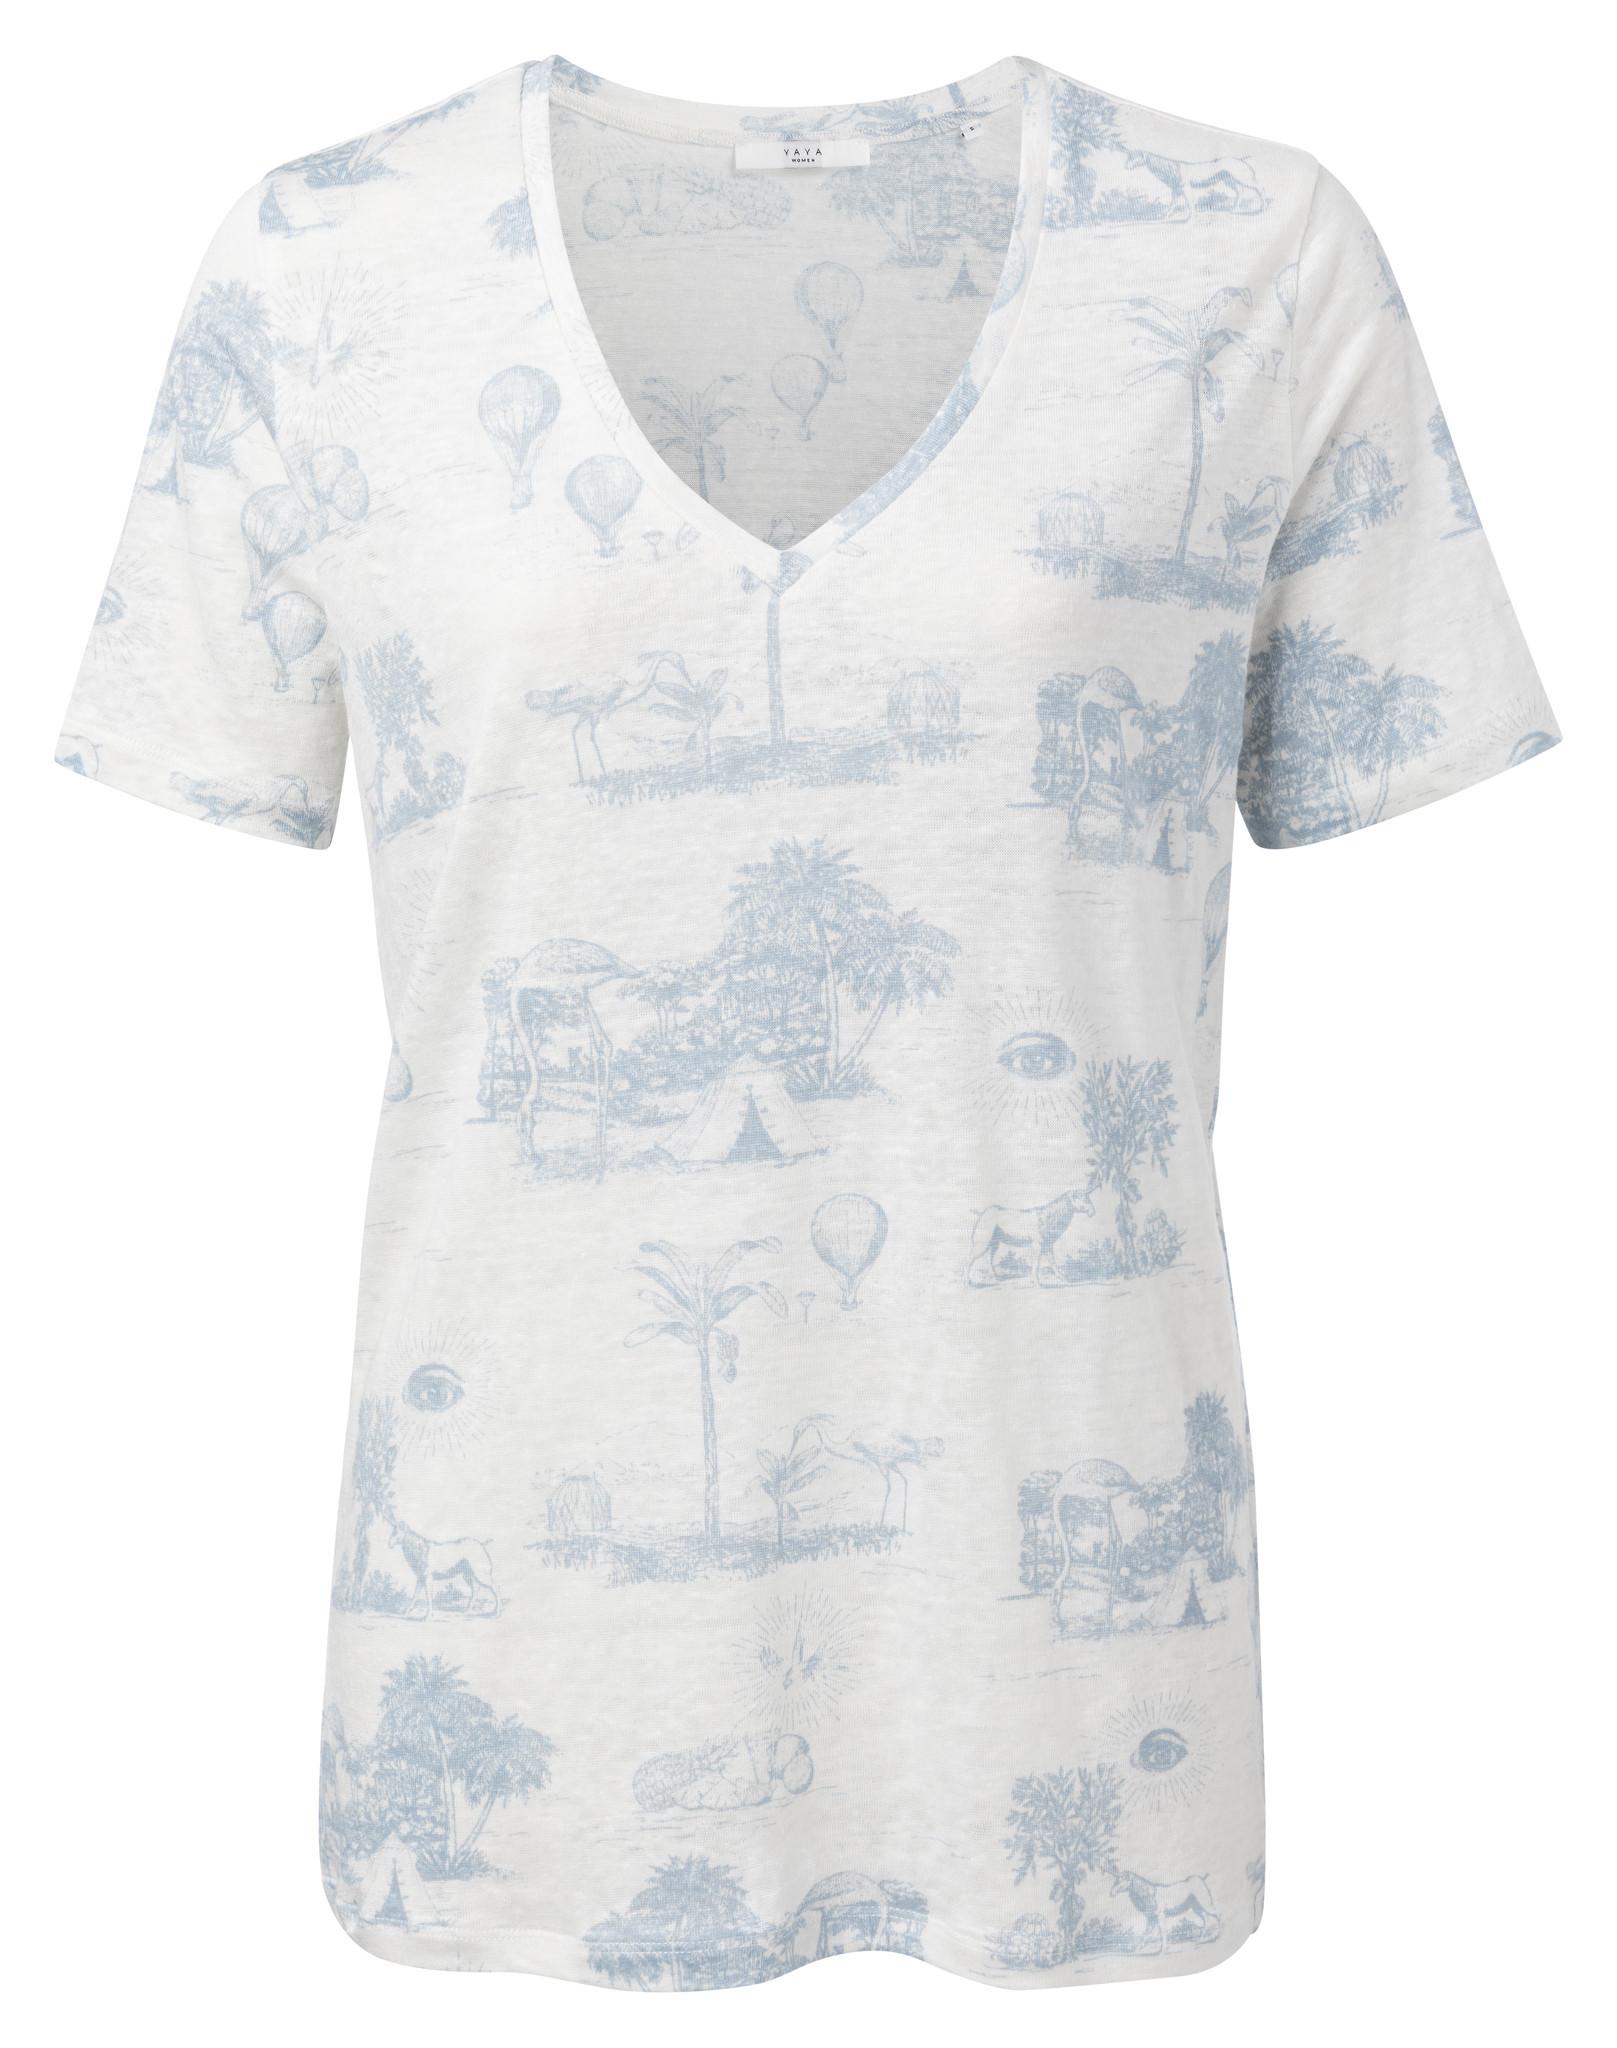 yaya Linen T-shirt with s 1909286-014-1